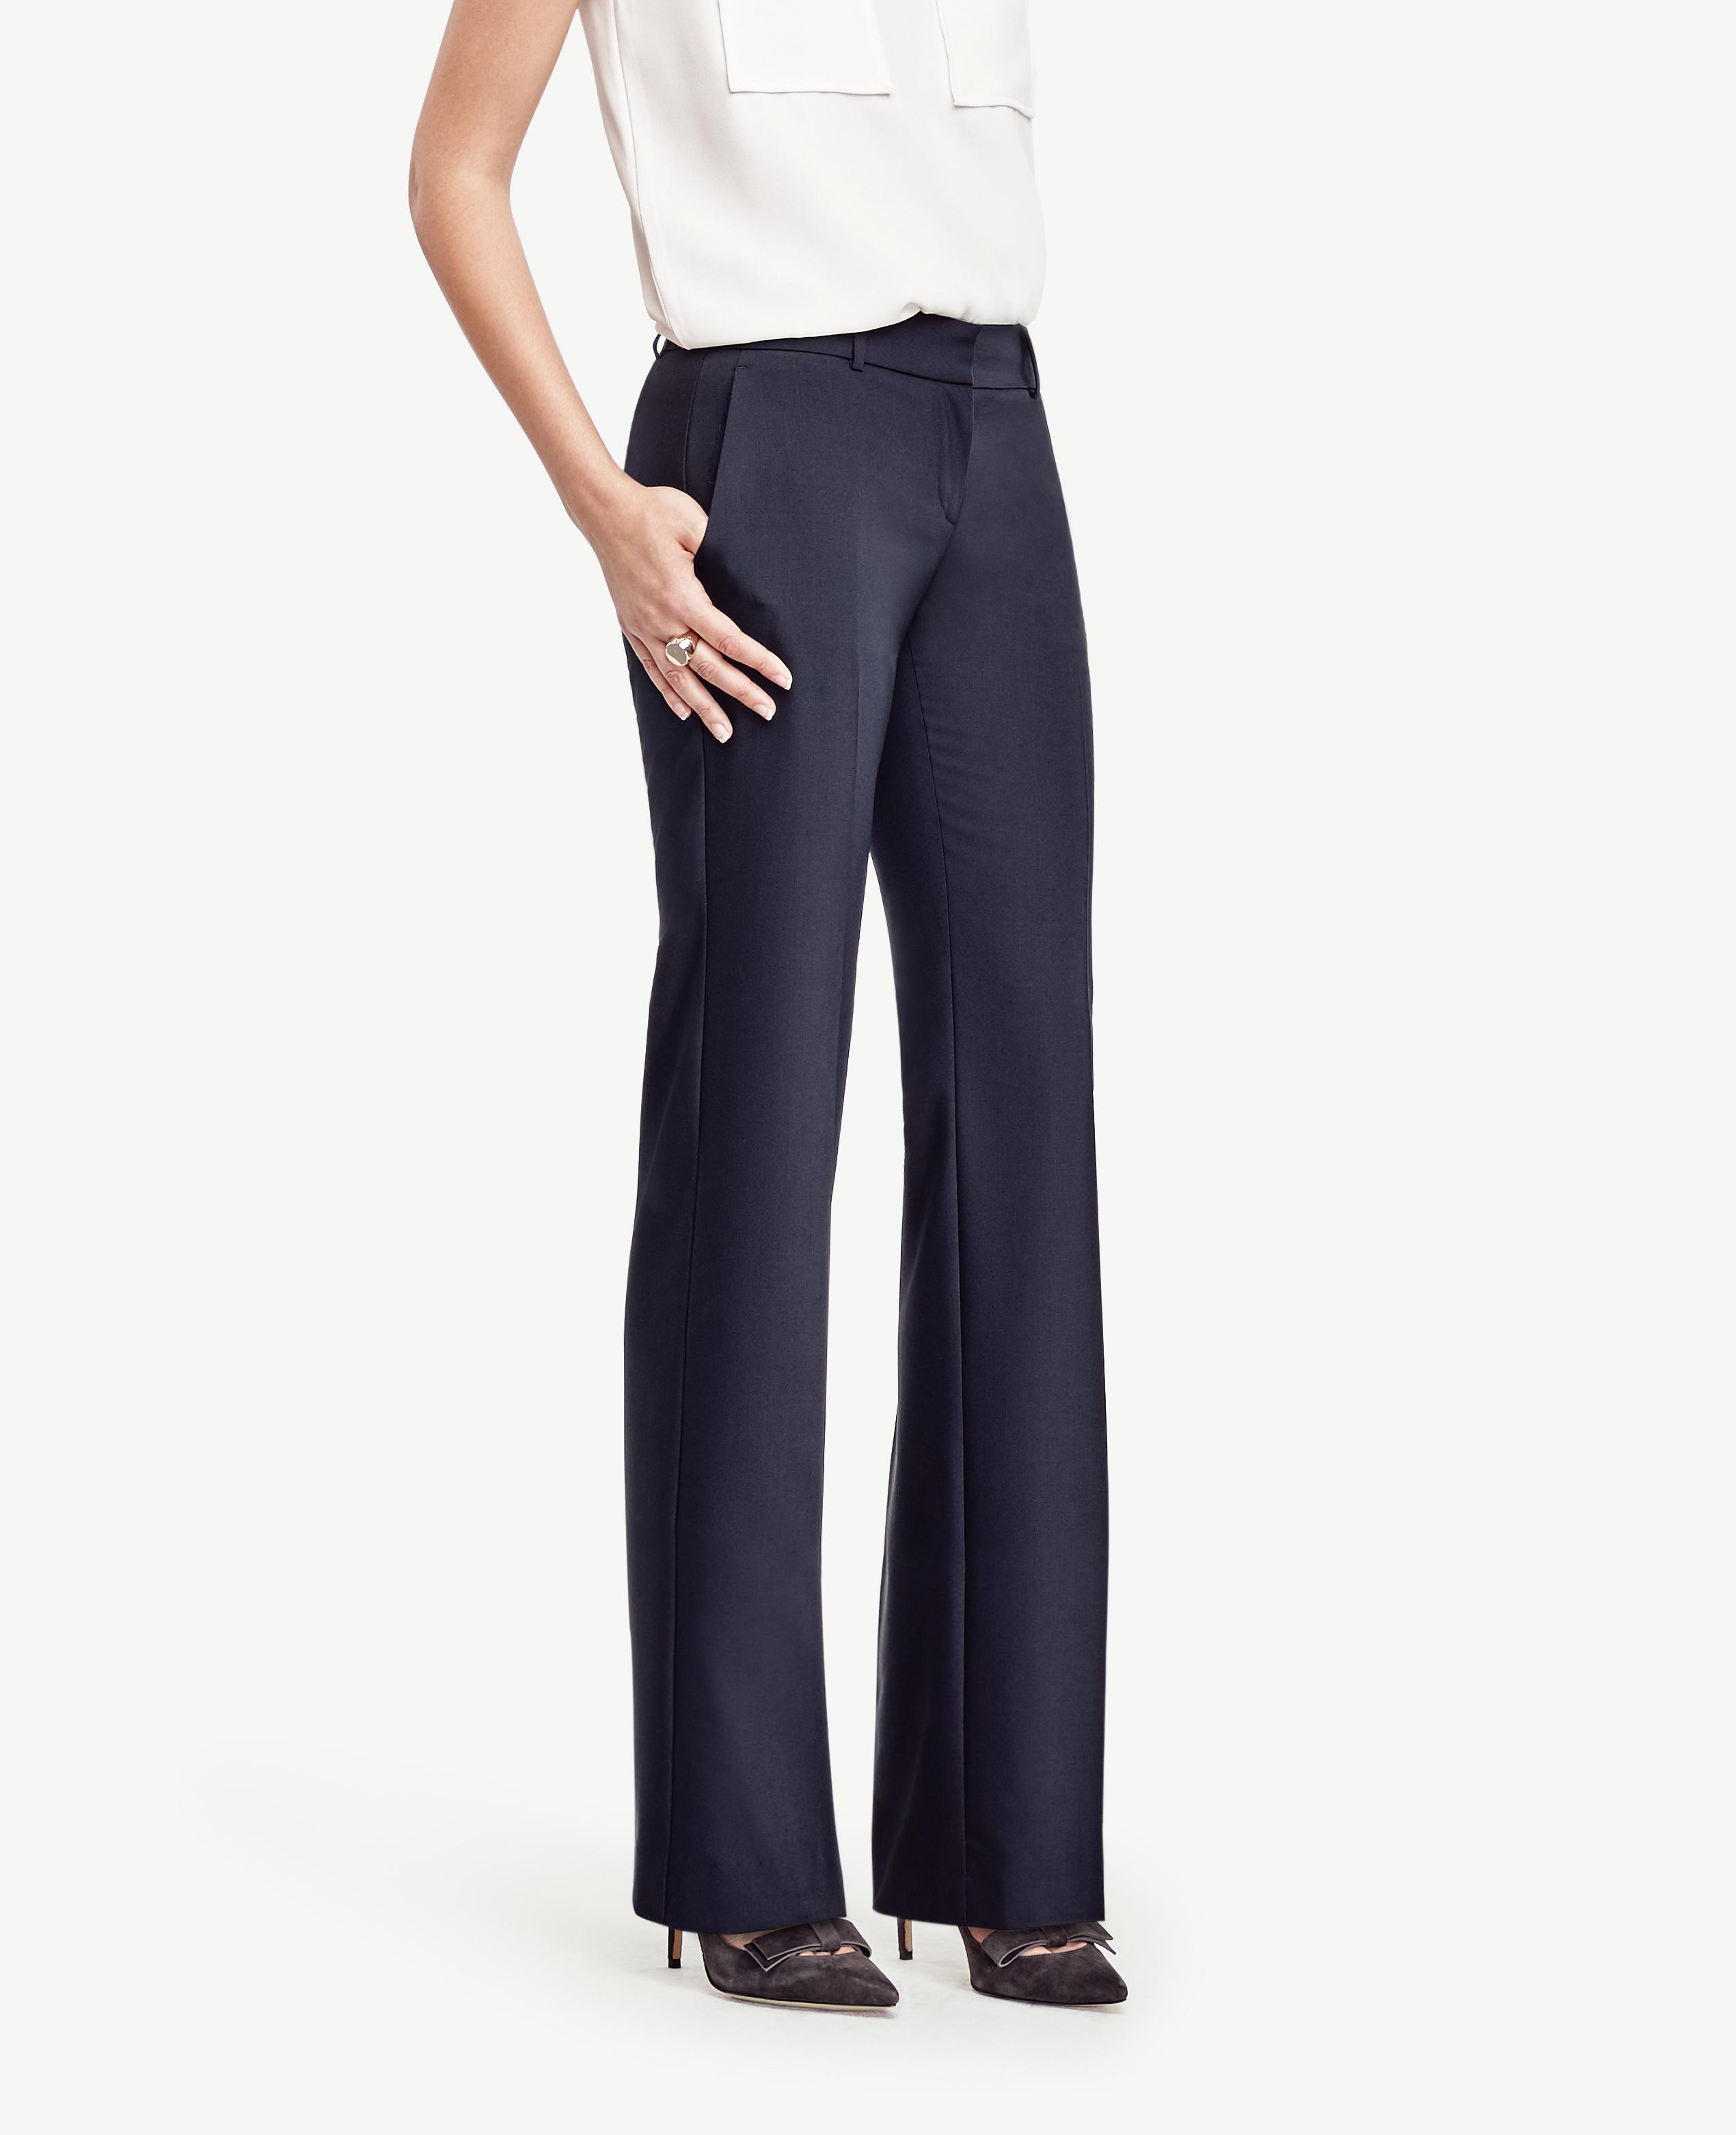 Loft Curvy Fit Pants